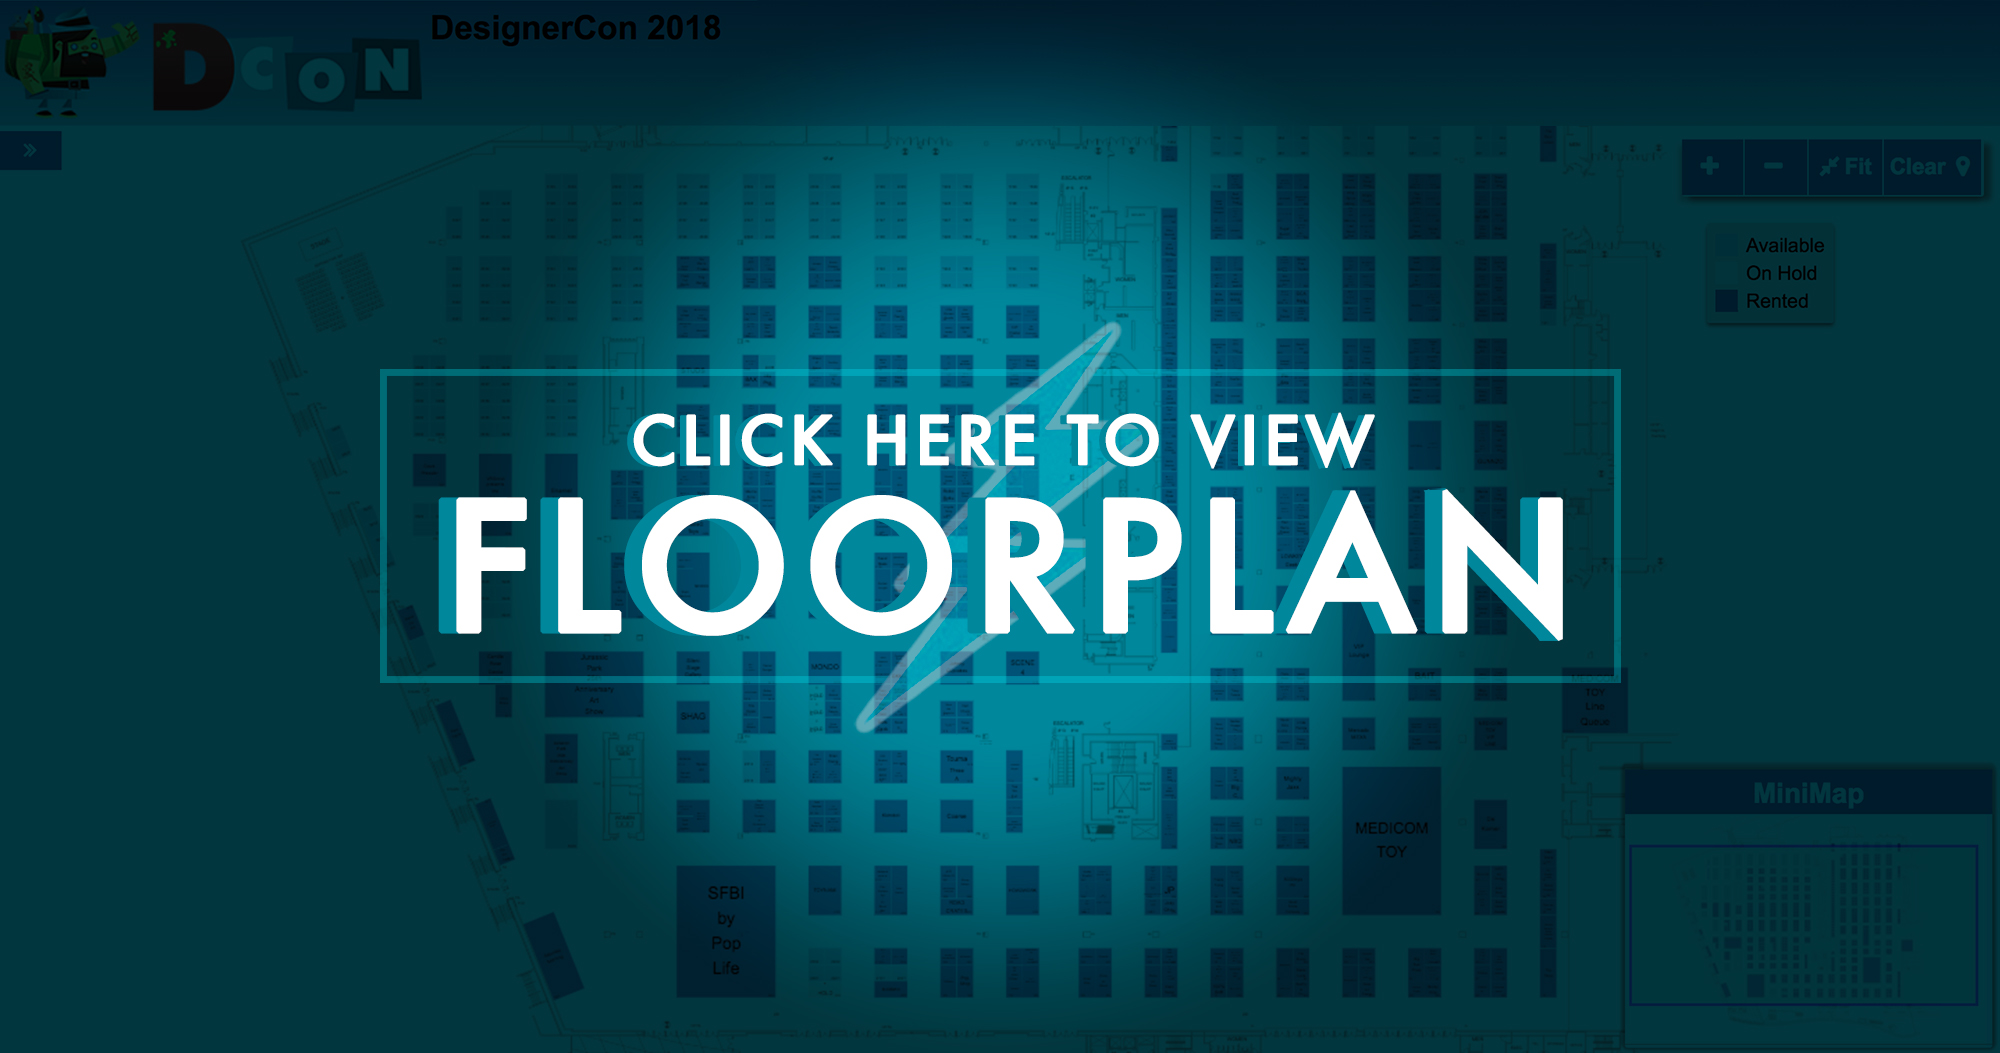 DC_DCon_Deck_Vendors_2018_Floorplan.jpg